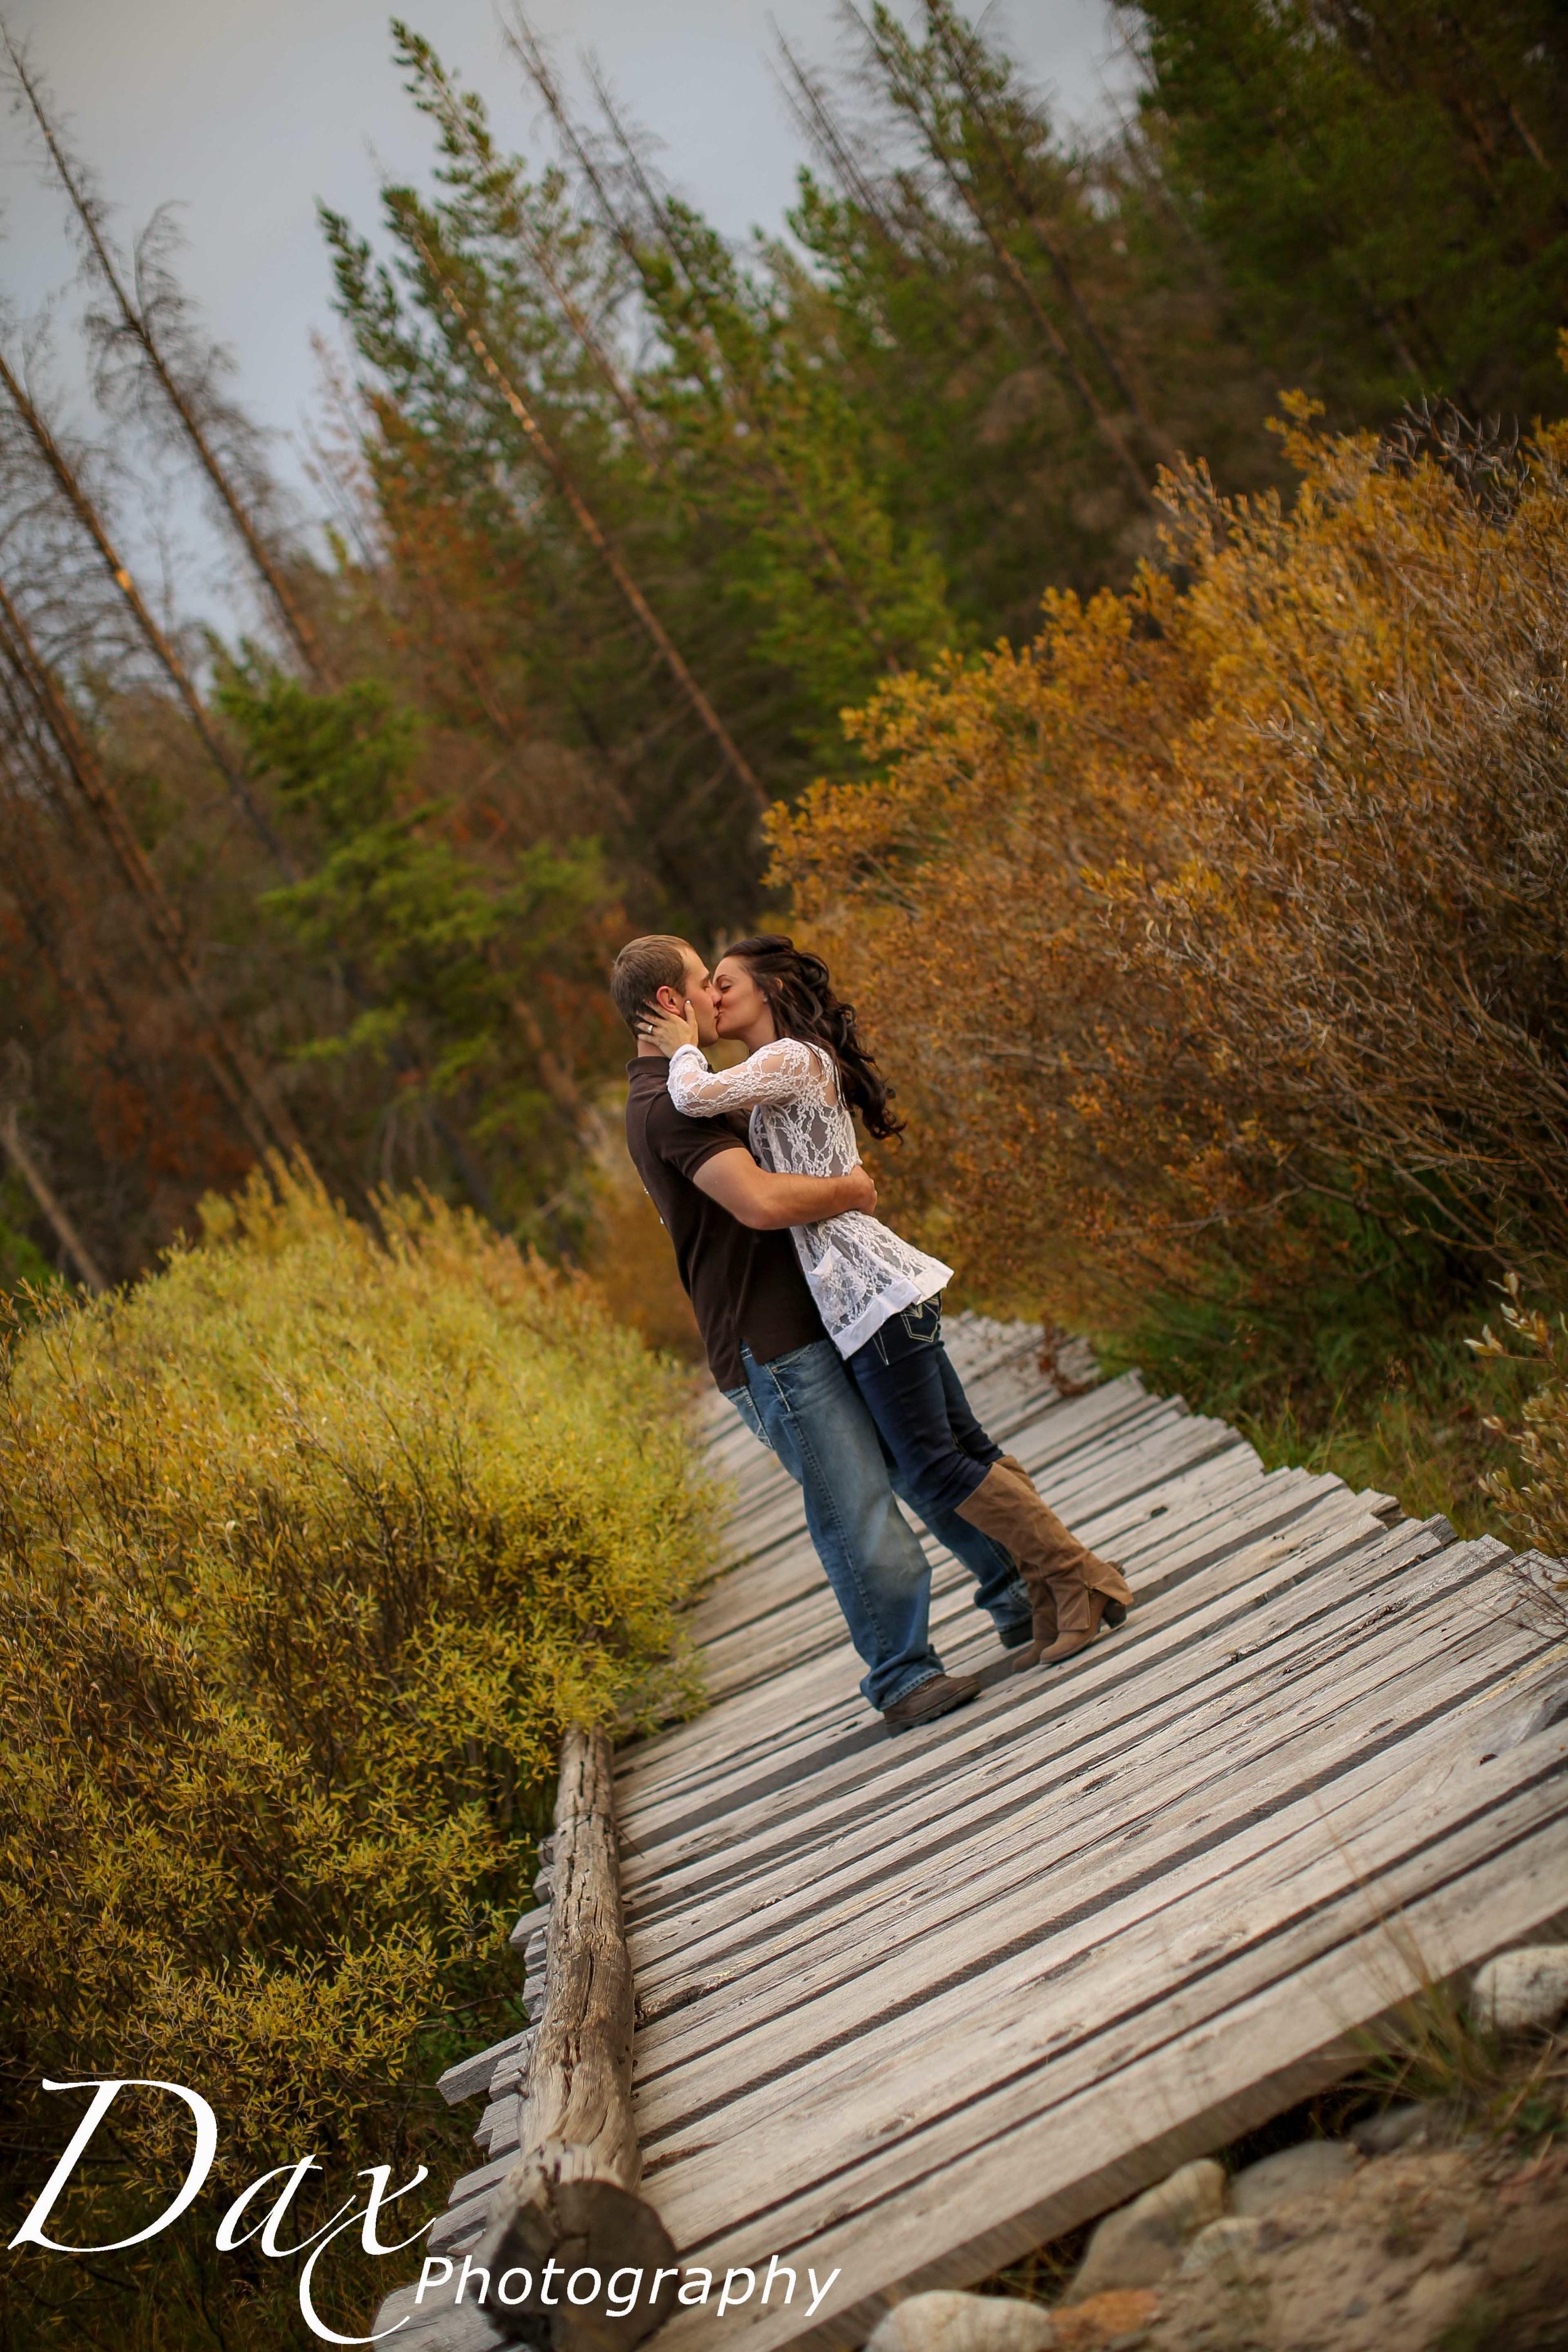 wpid-Montana-photographer-Engagement-Portrait-47511.jpg